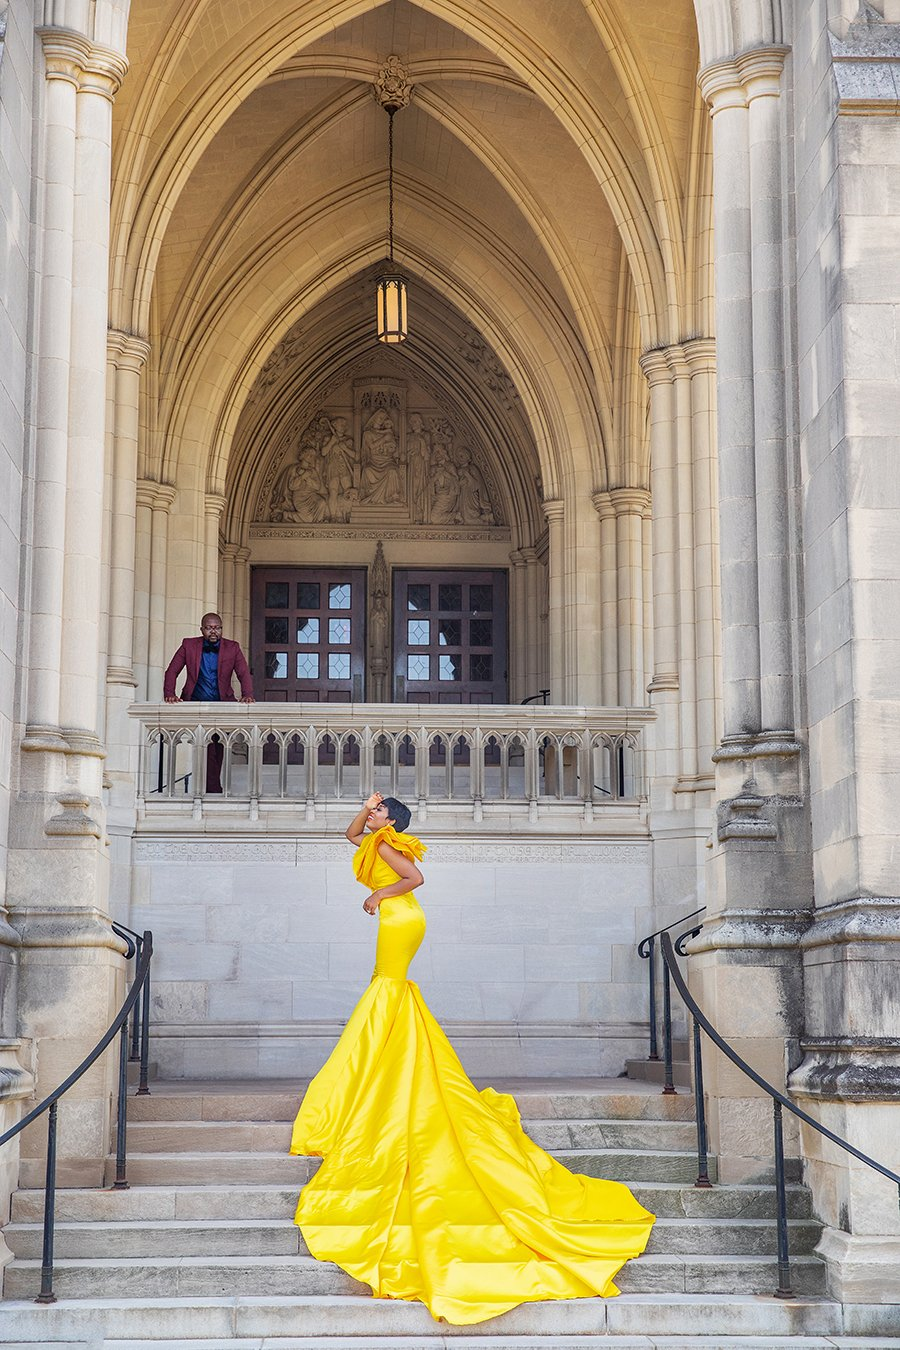 stella-adewunmi-of-jadore-fashion-blog-shares-10-years-celebrating-wedding-anniversary